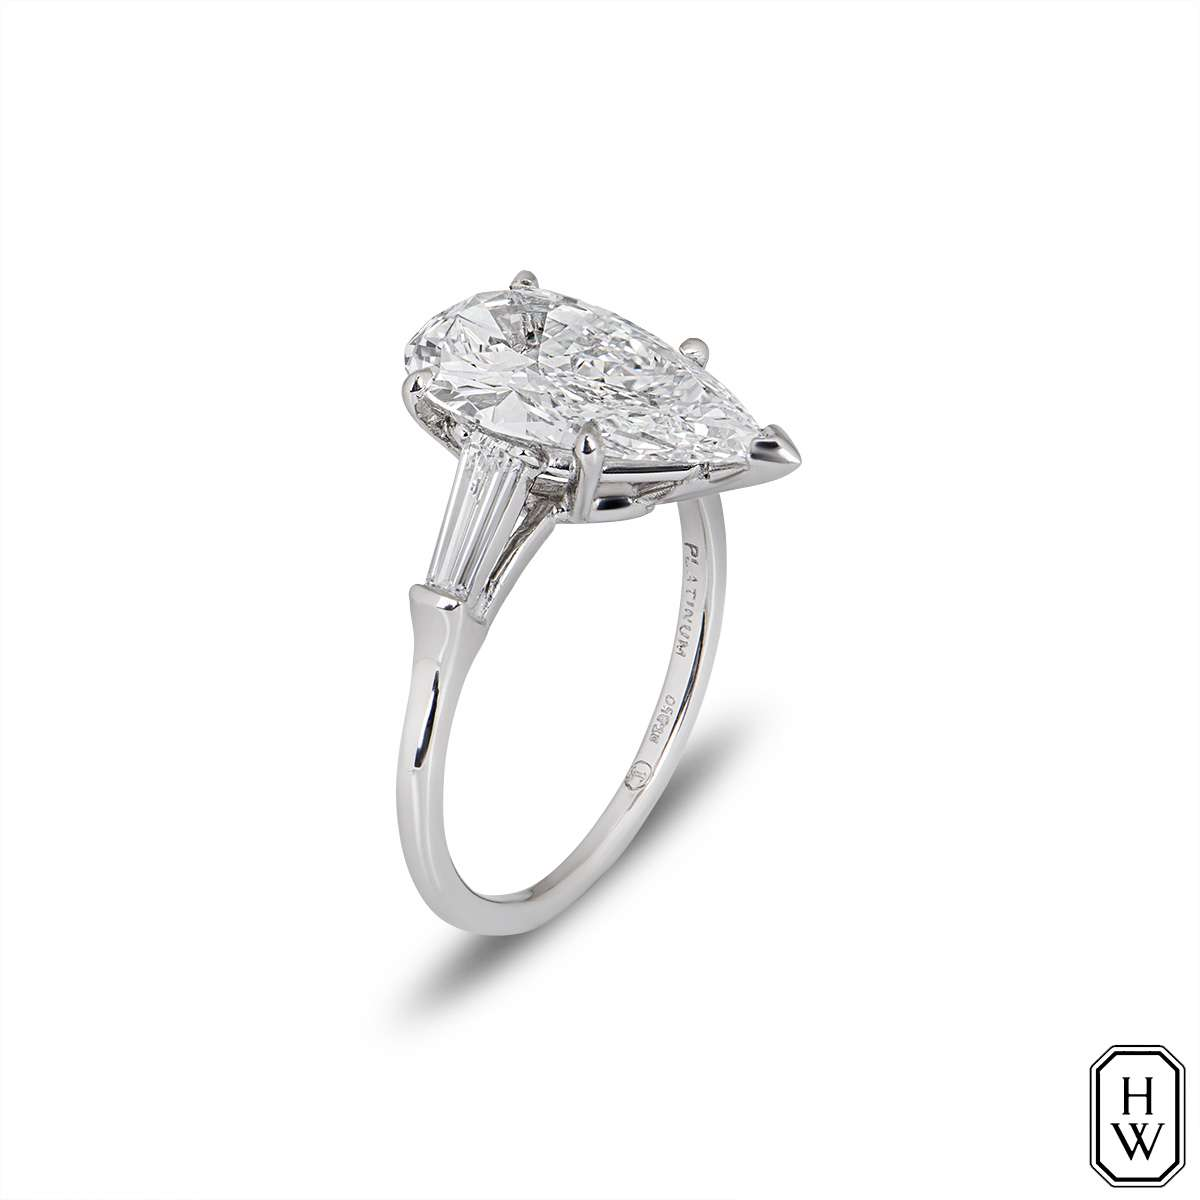 Harry Winston Platinum Pear Cut Diamond Ring 2.67ct E/FL